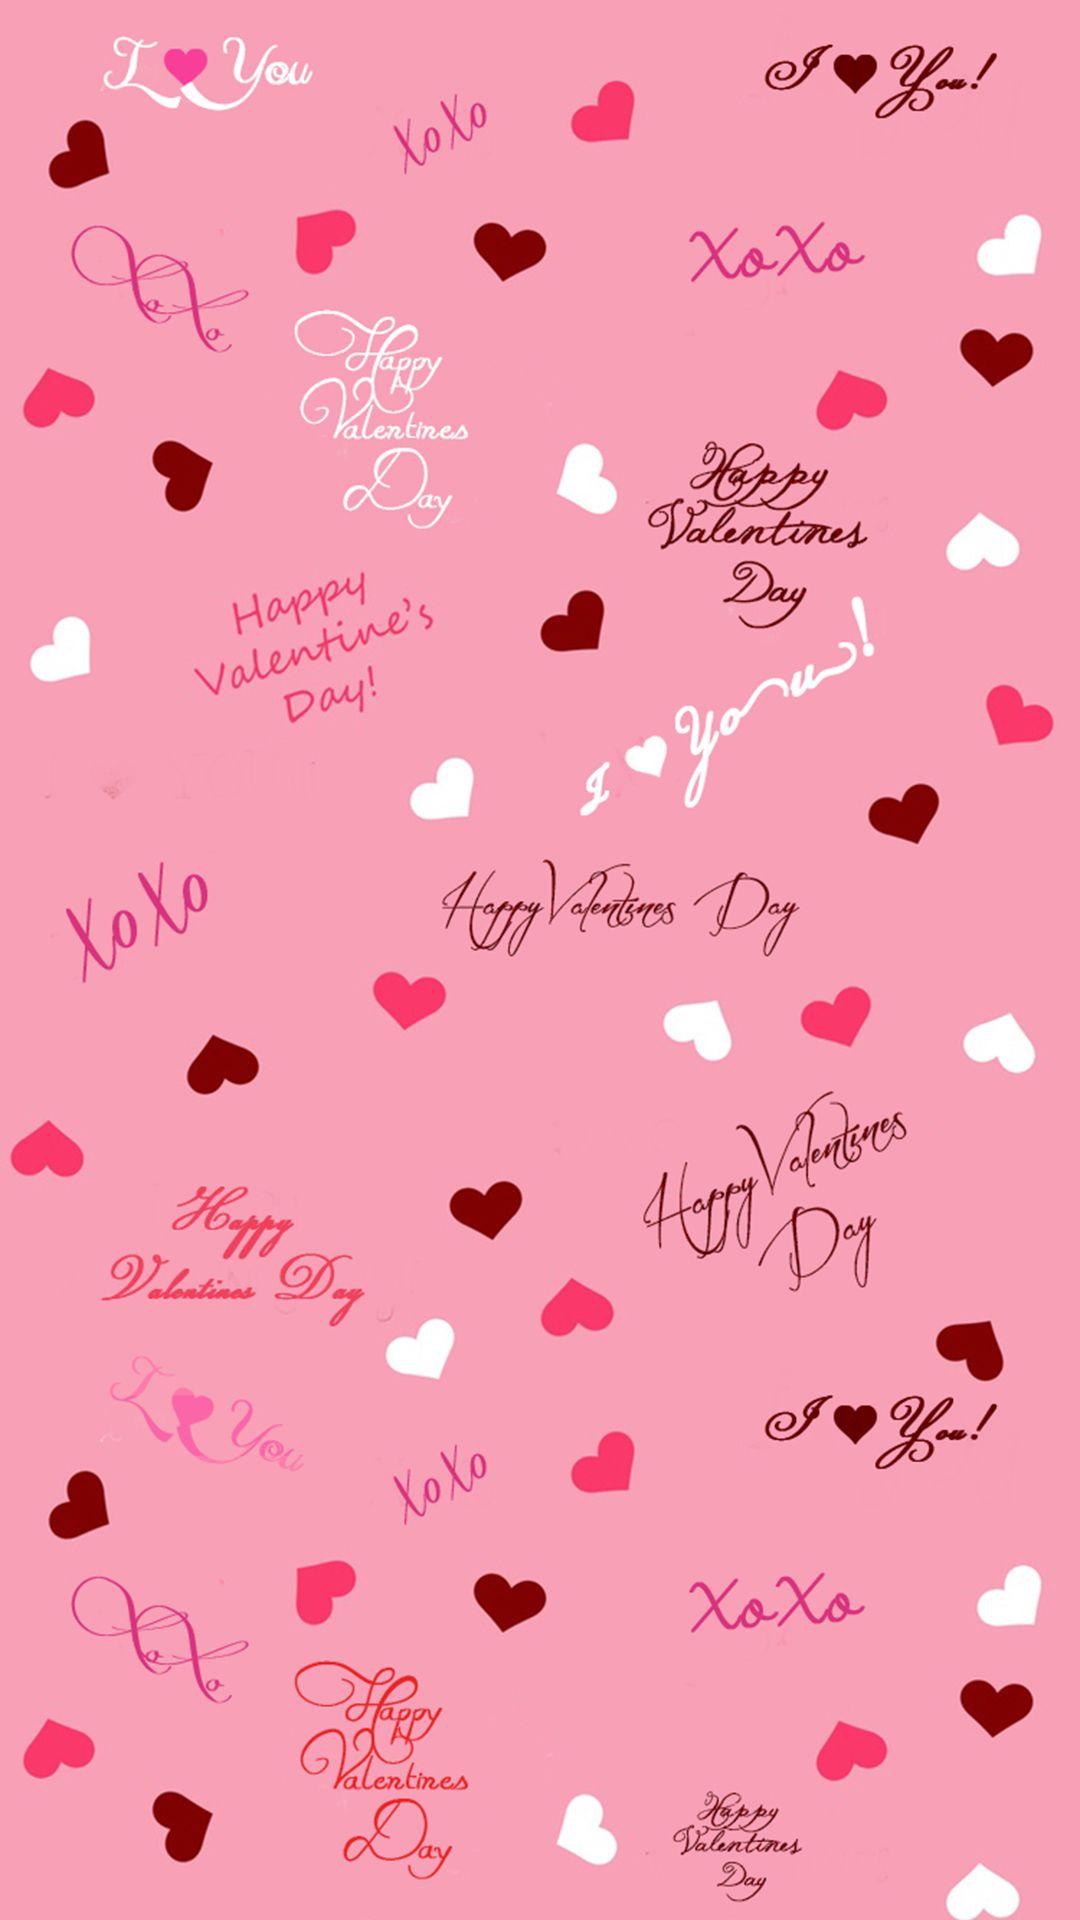 66 Valentine Pictures Wallpaper On Wallpapersafari